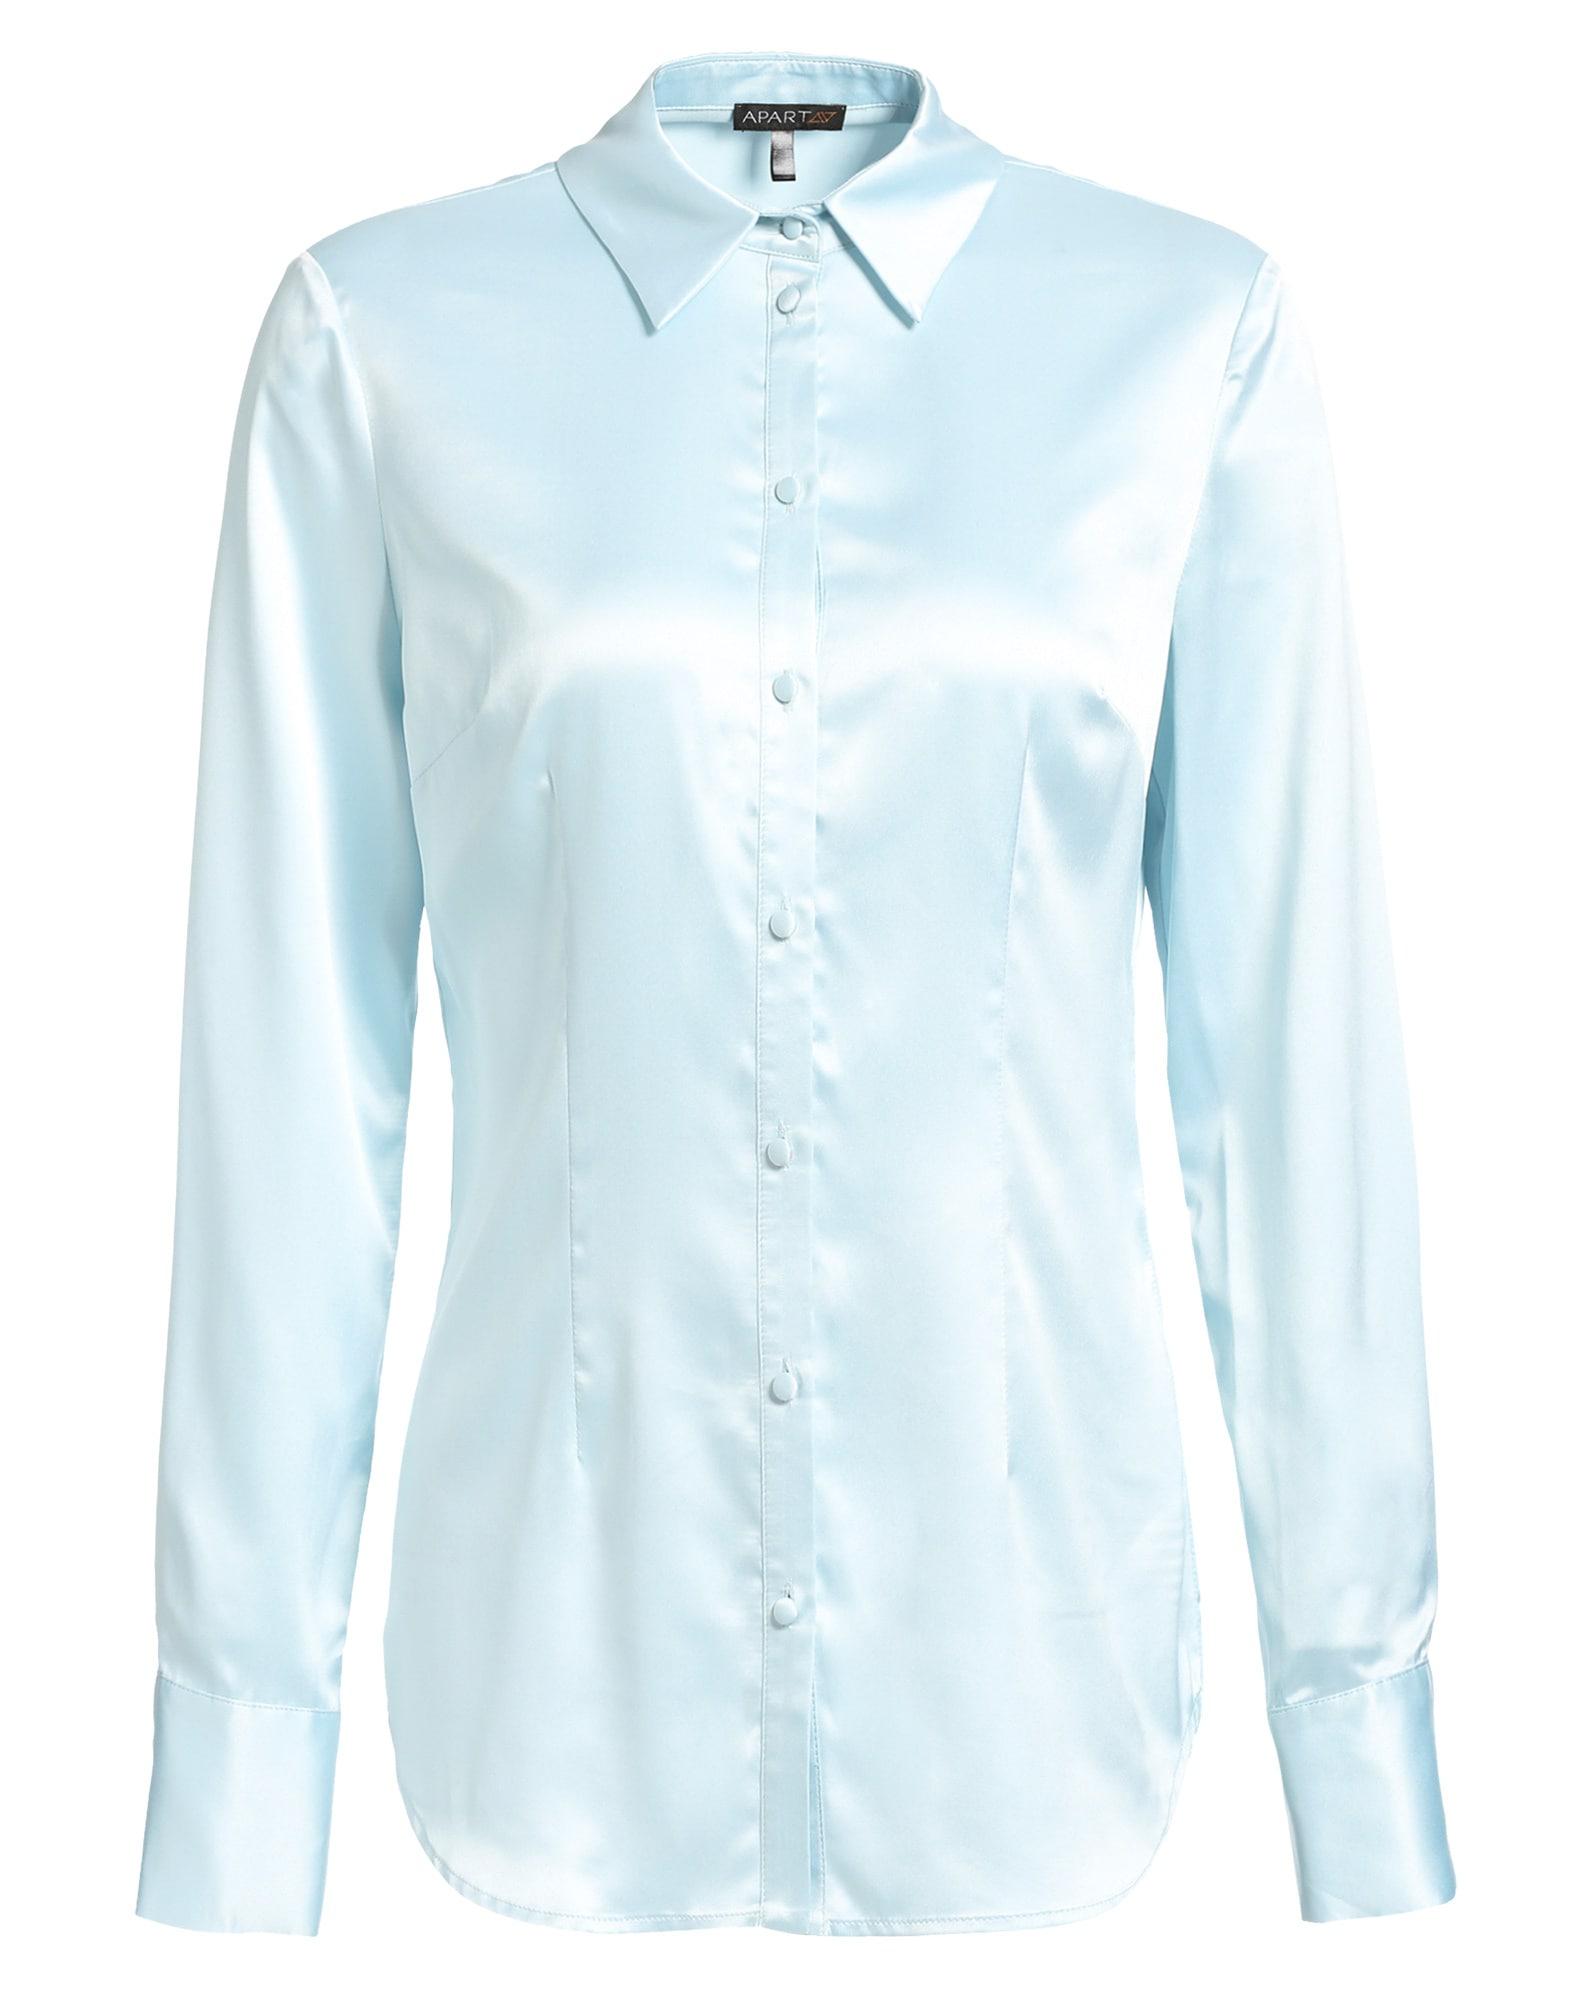 Satinbluse aus glänzendem Satin | Bekleidung > Blusen > Satinblusen | Apart